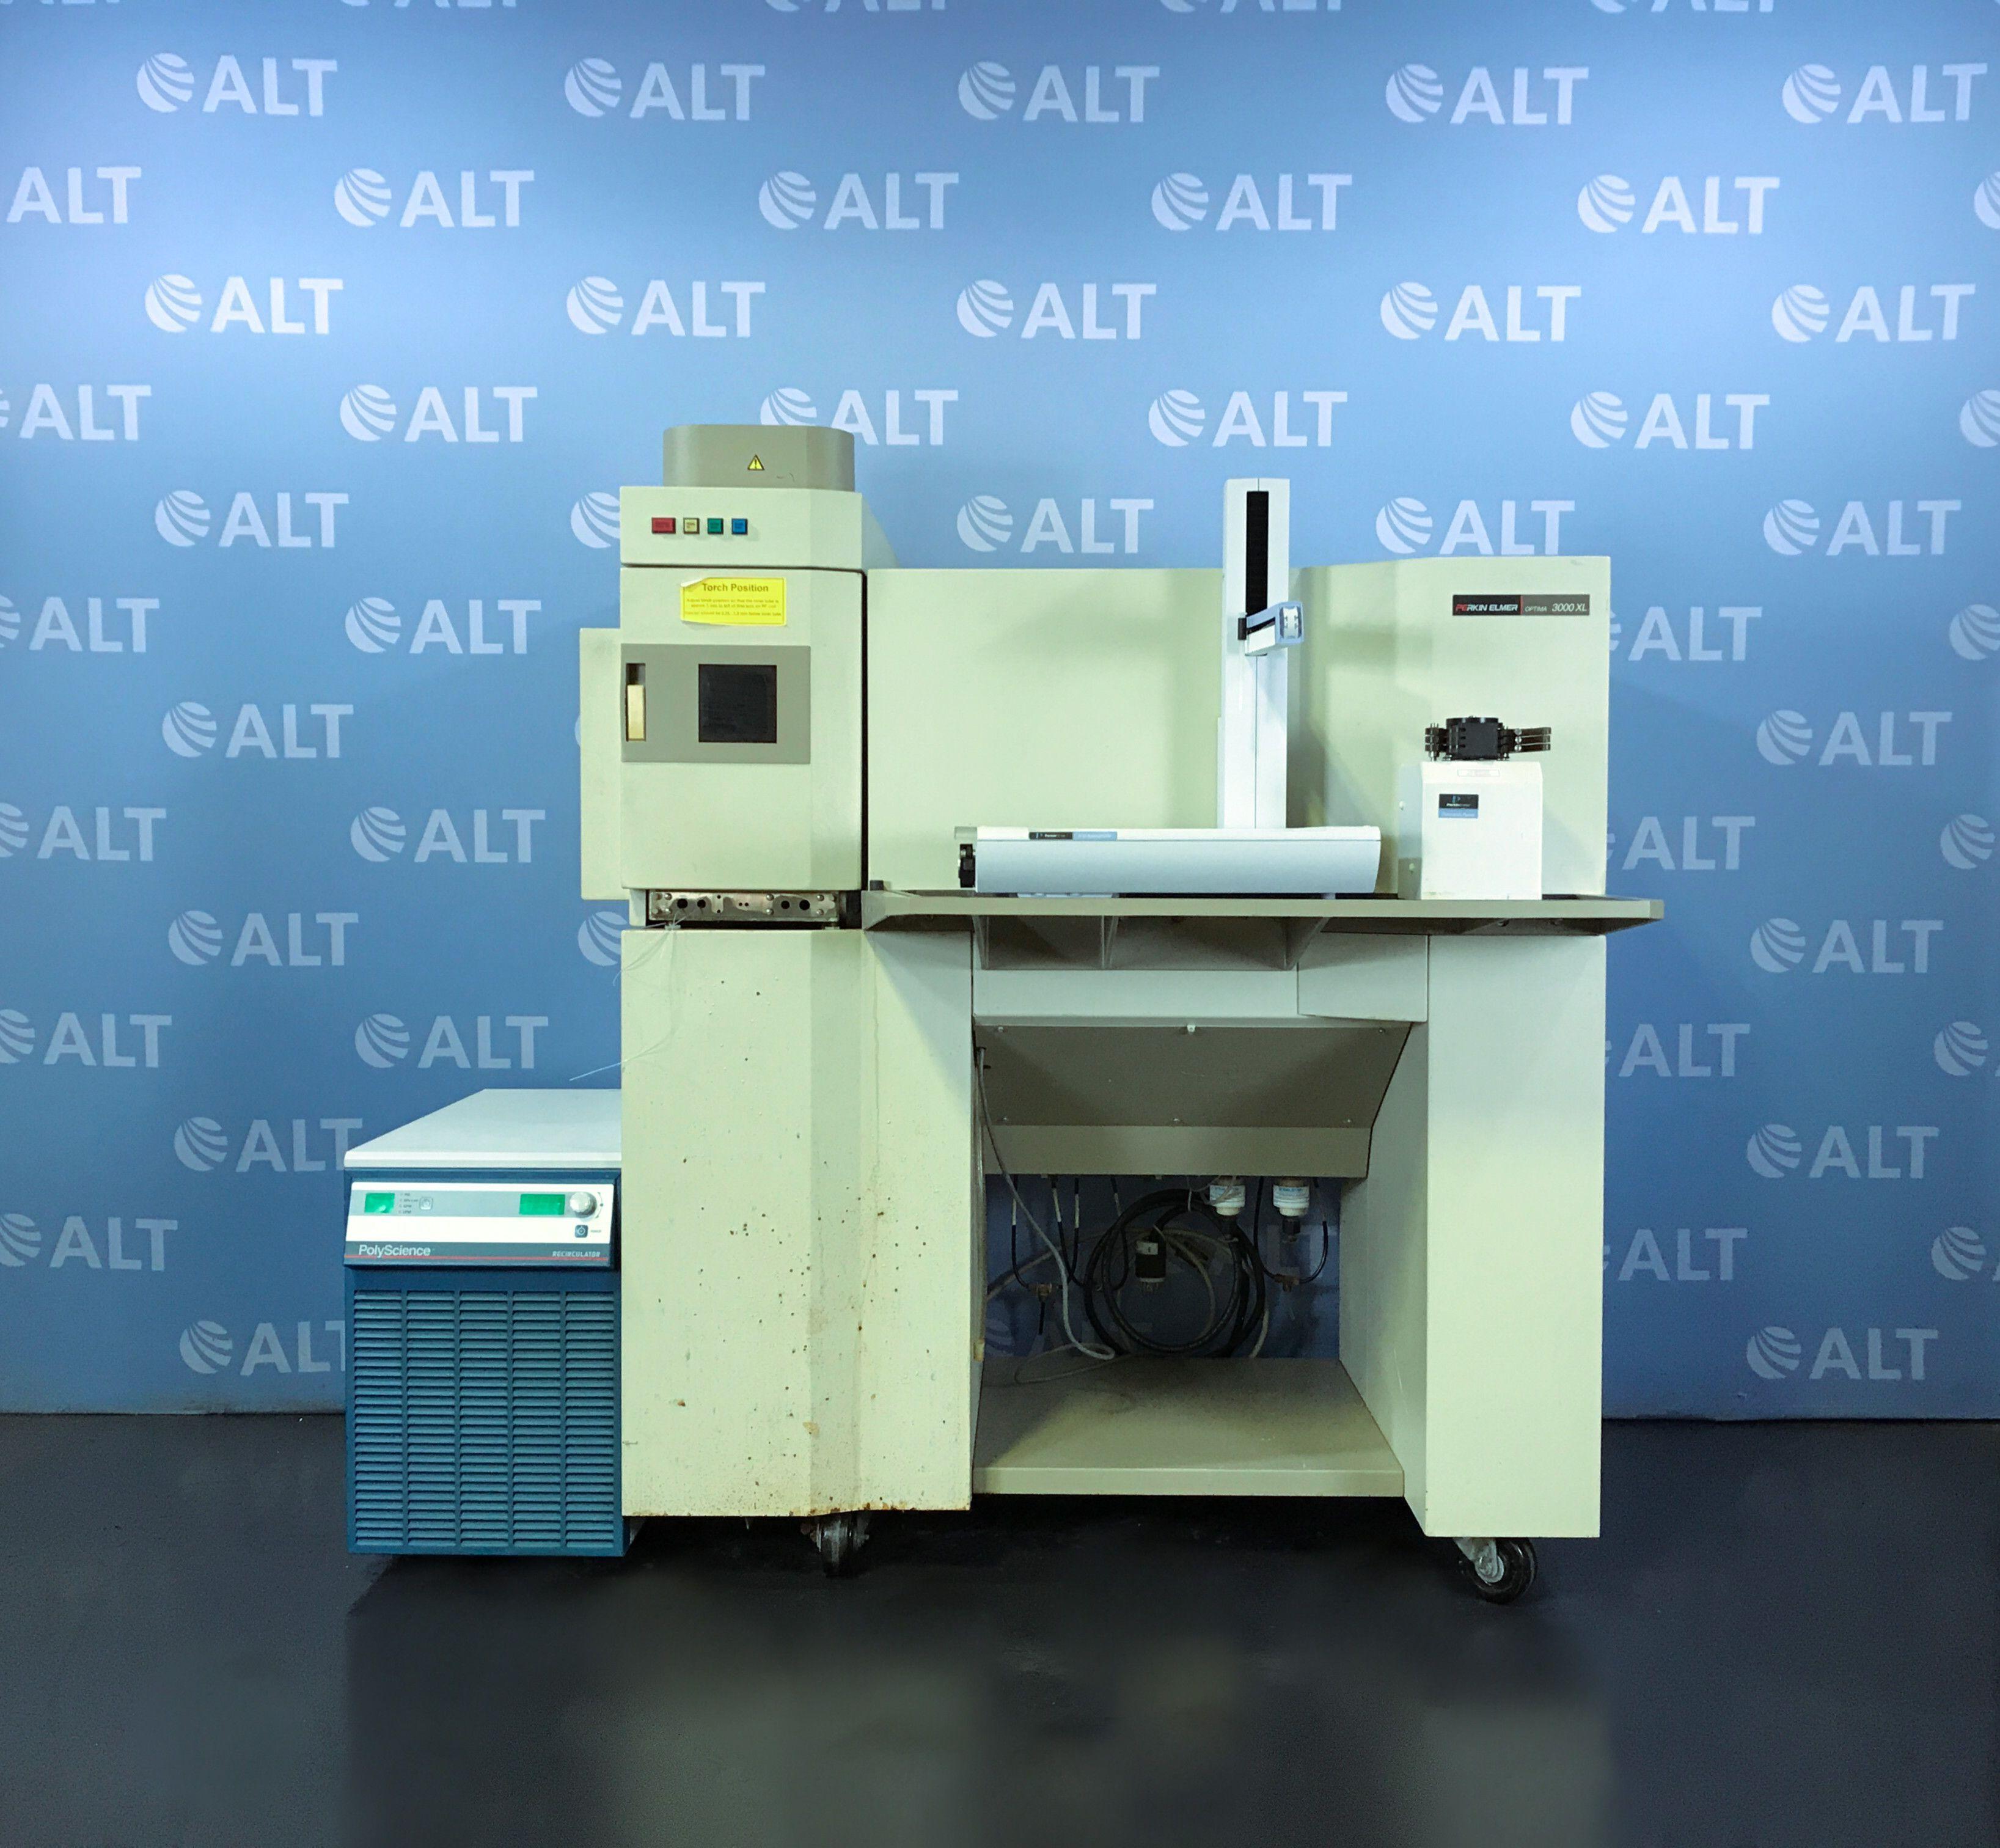 Perkin Elmer Optima 3000 XL ICP-OES Spectrometer with Perkin Elmer S10 Autosampler